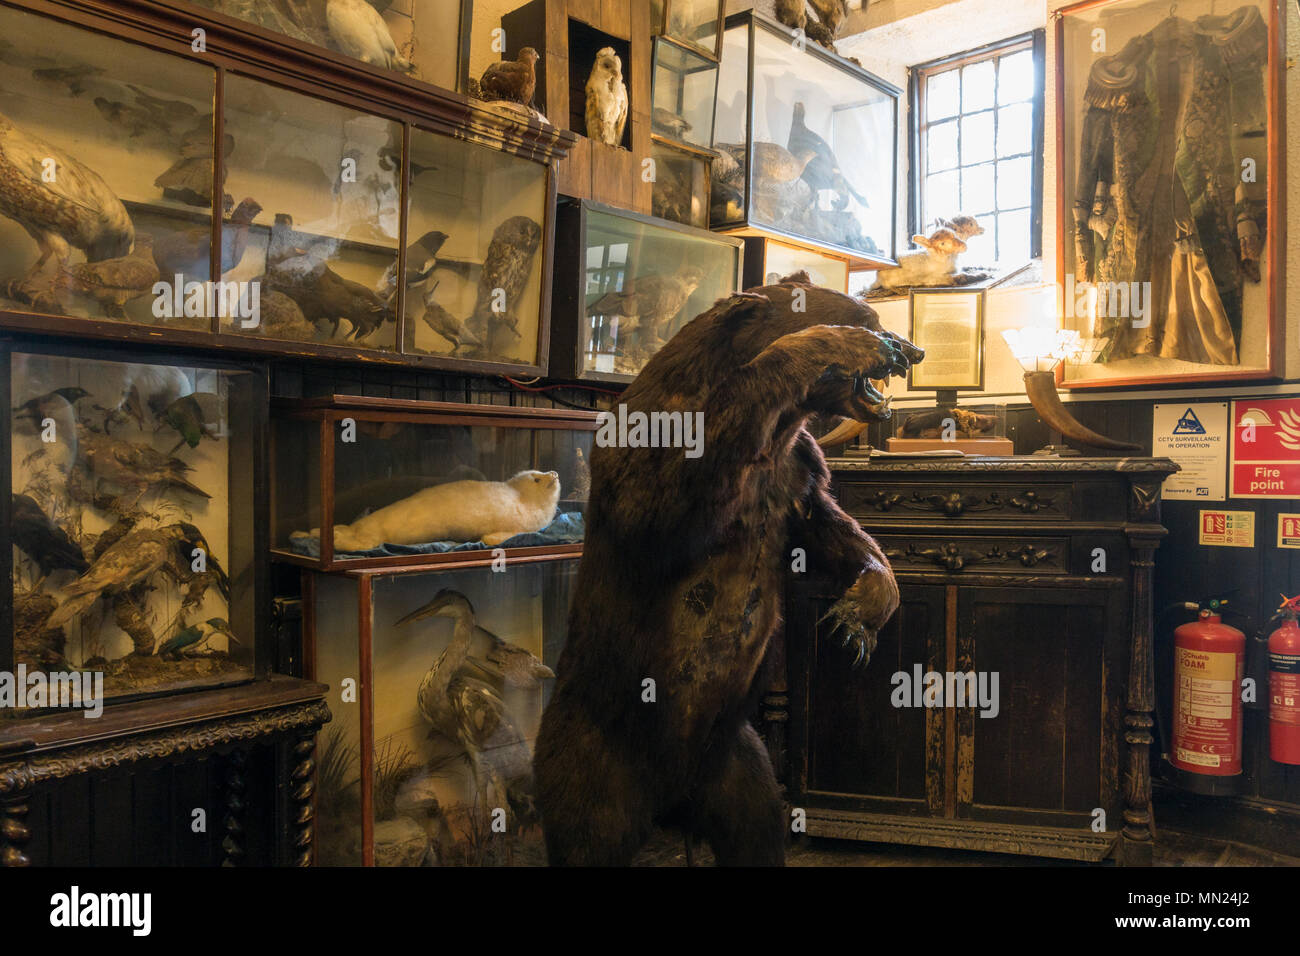 The Drovers Inn interior - reception area with stuffed animals, Loch Lomond, Inverarnan, Scotland, UK - Stock Image